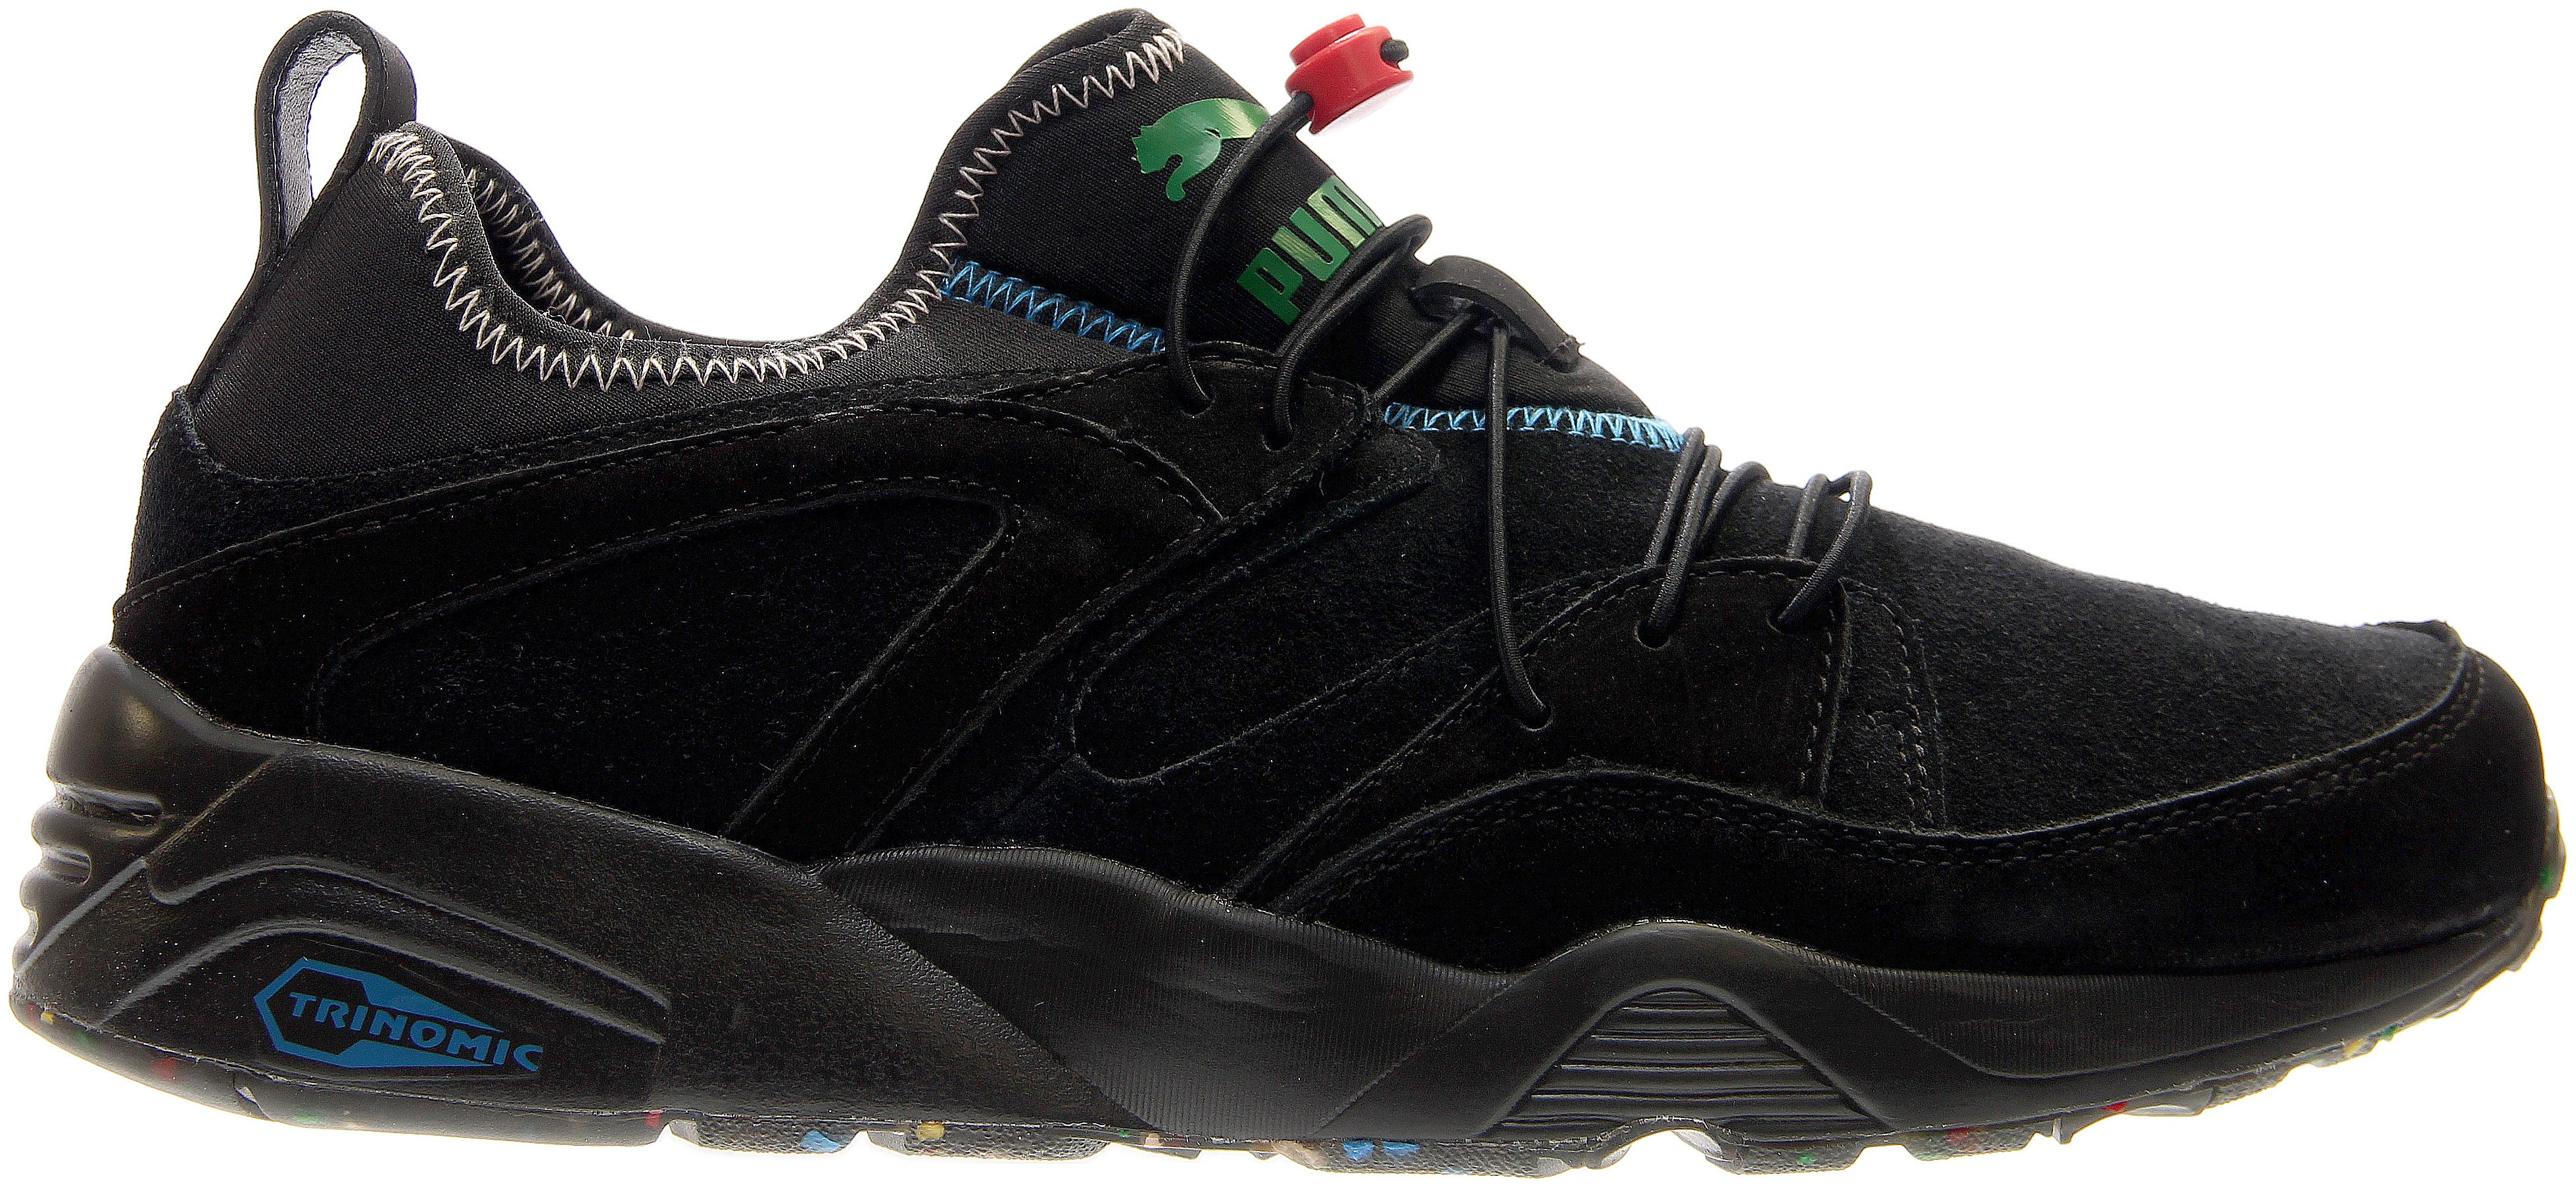 Details about Puma Blaze of Glory Soft Flag Sneakers - Black - Mens 72c1563c0